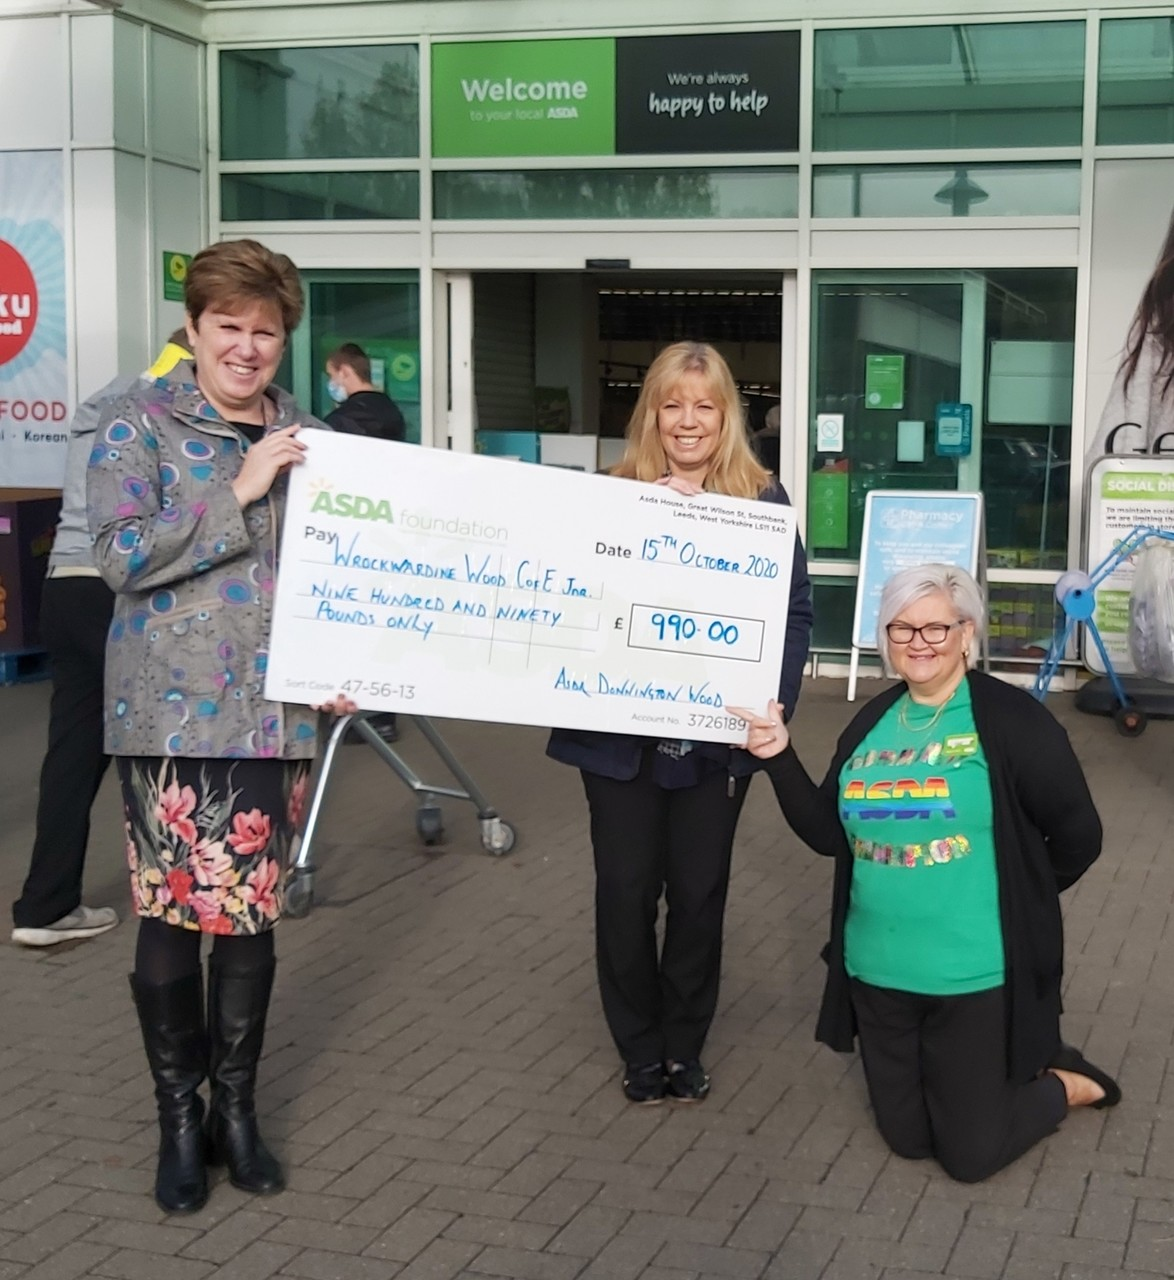 £990 grant for Wrockwardine Wood CE Junior School | Asda Donnington Wood